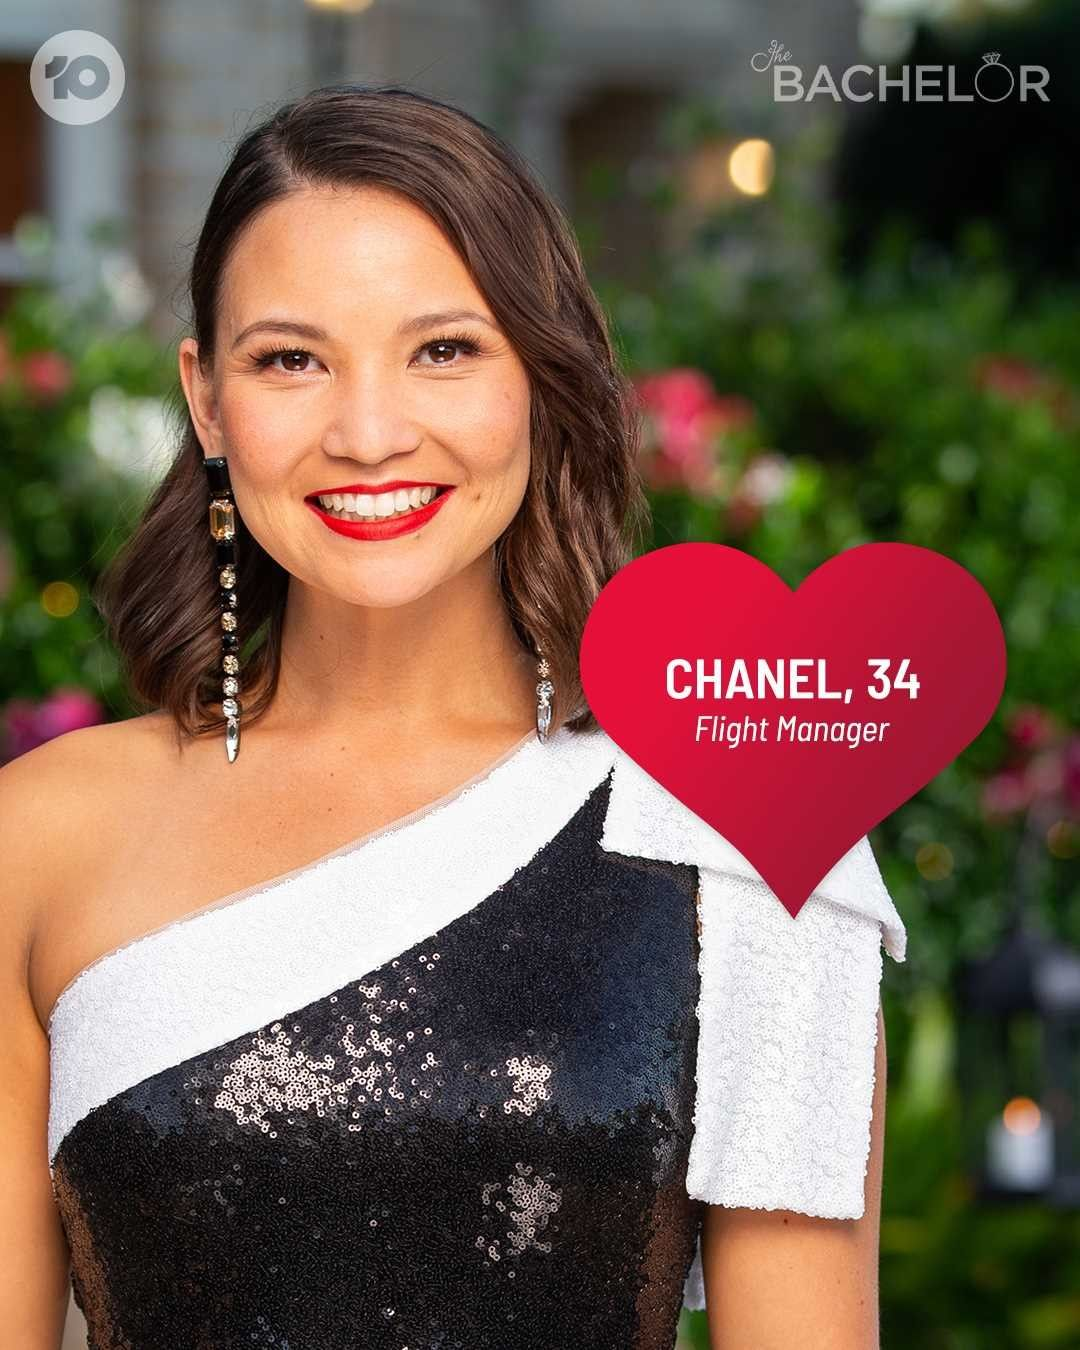 Bachelor Australia - Season 9 - Jimmy Nicholson - Chanel Tang - **Sleuthing Spoilers** 21414210